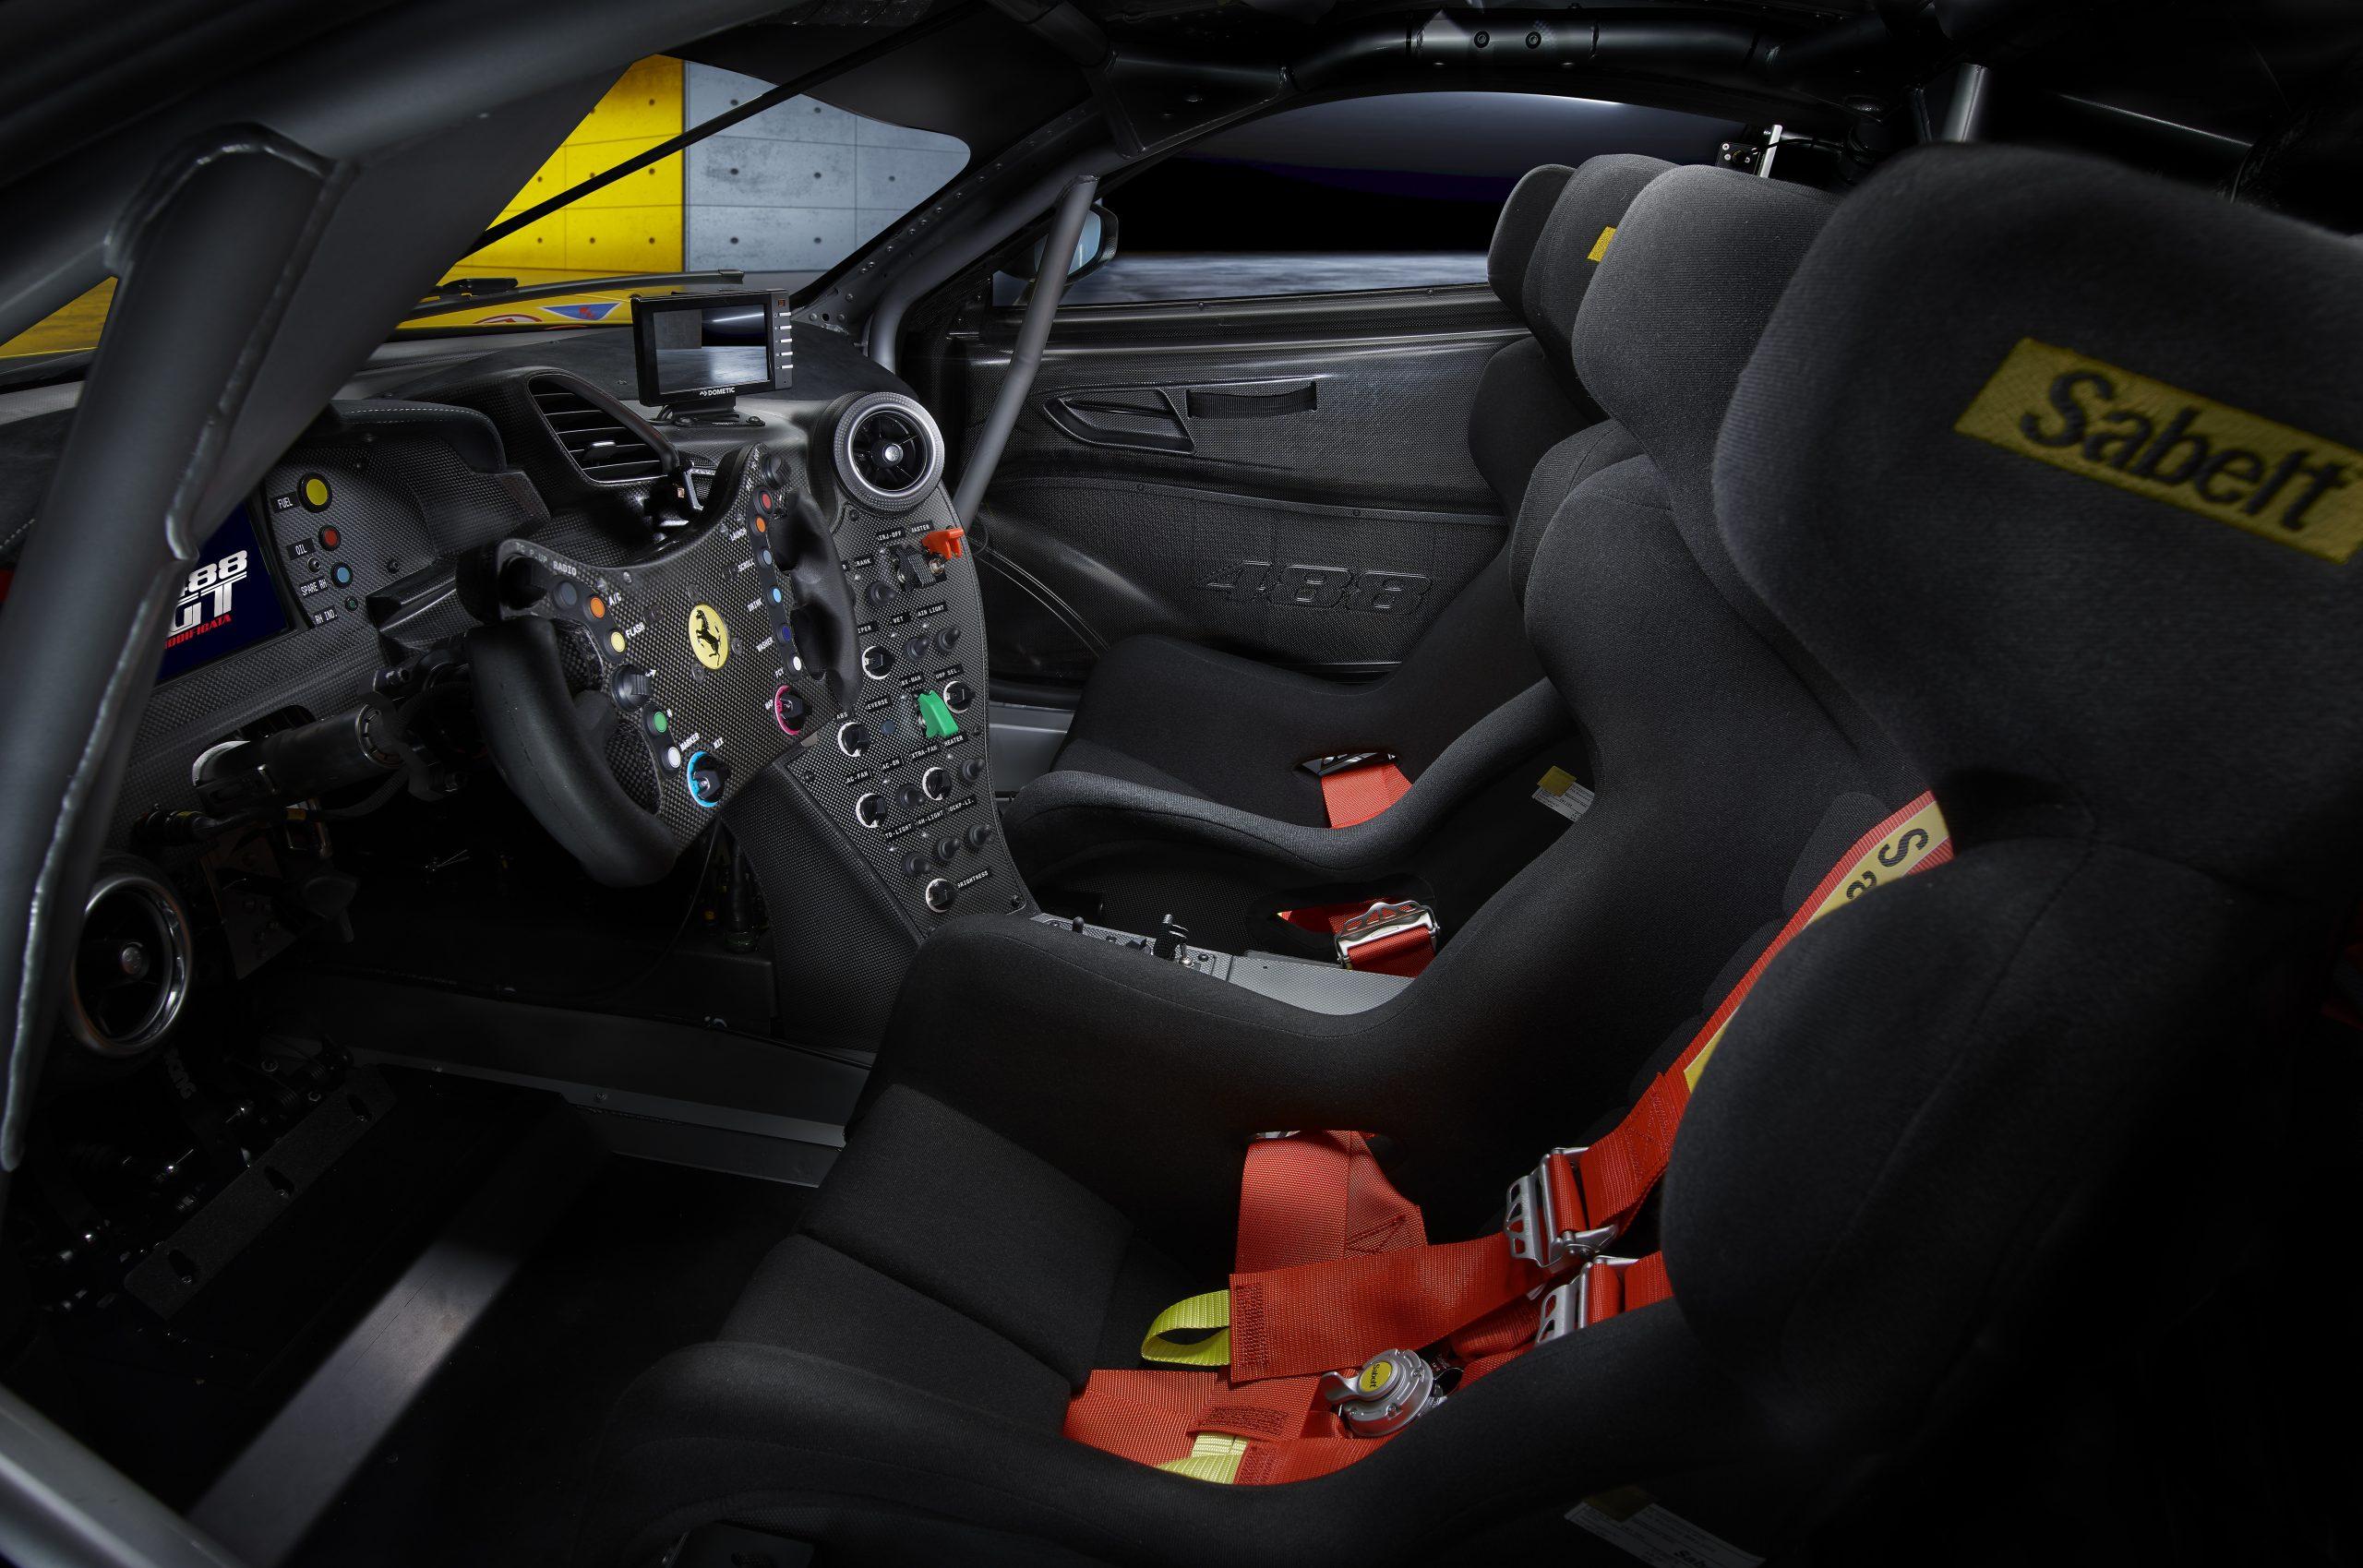 2020_11_Ferrari_488GT_interno_1